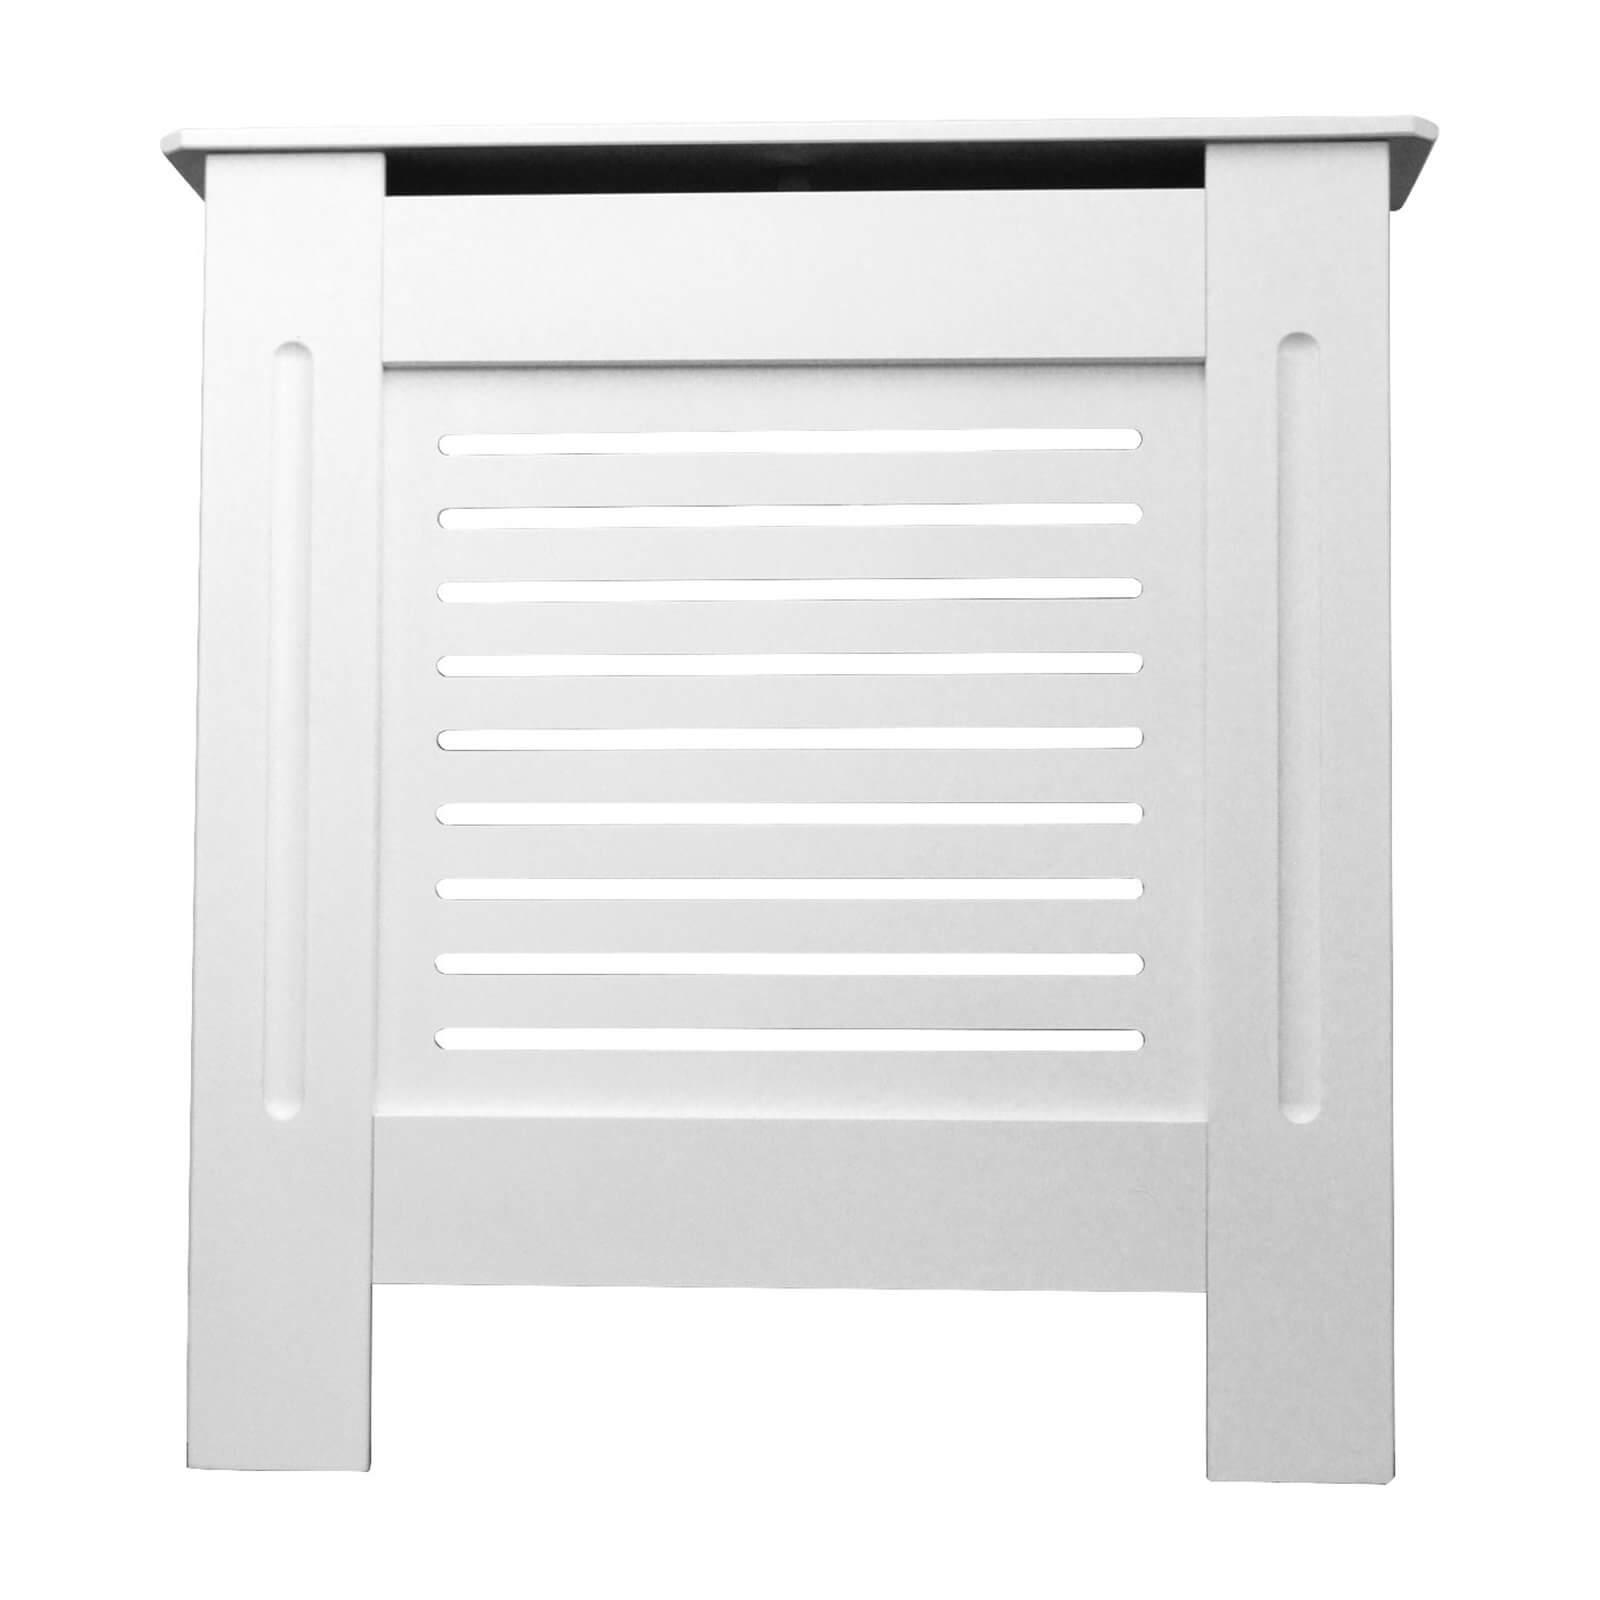 Horizontal White Radiator Cover - Mini